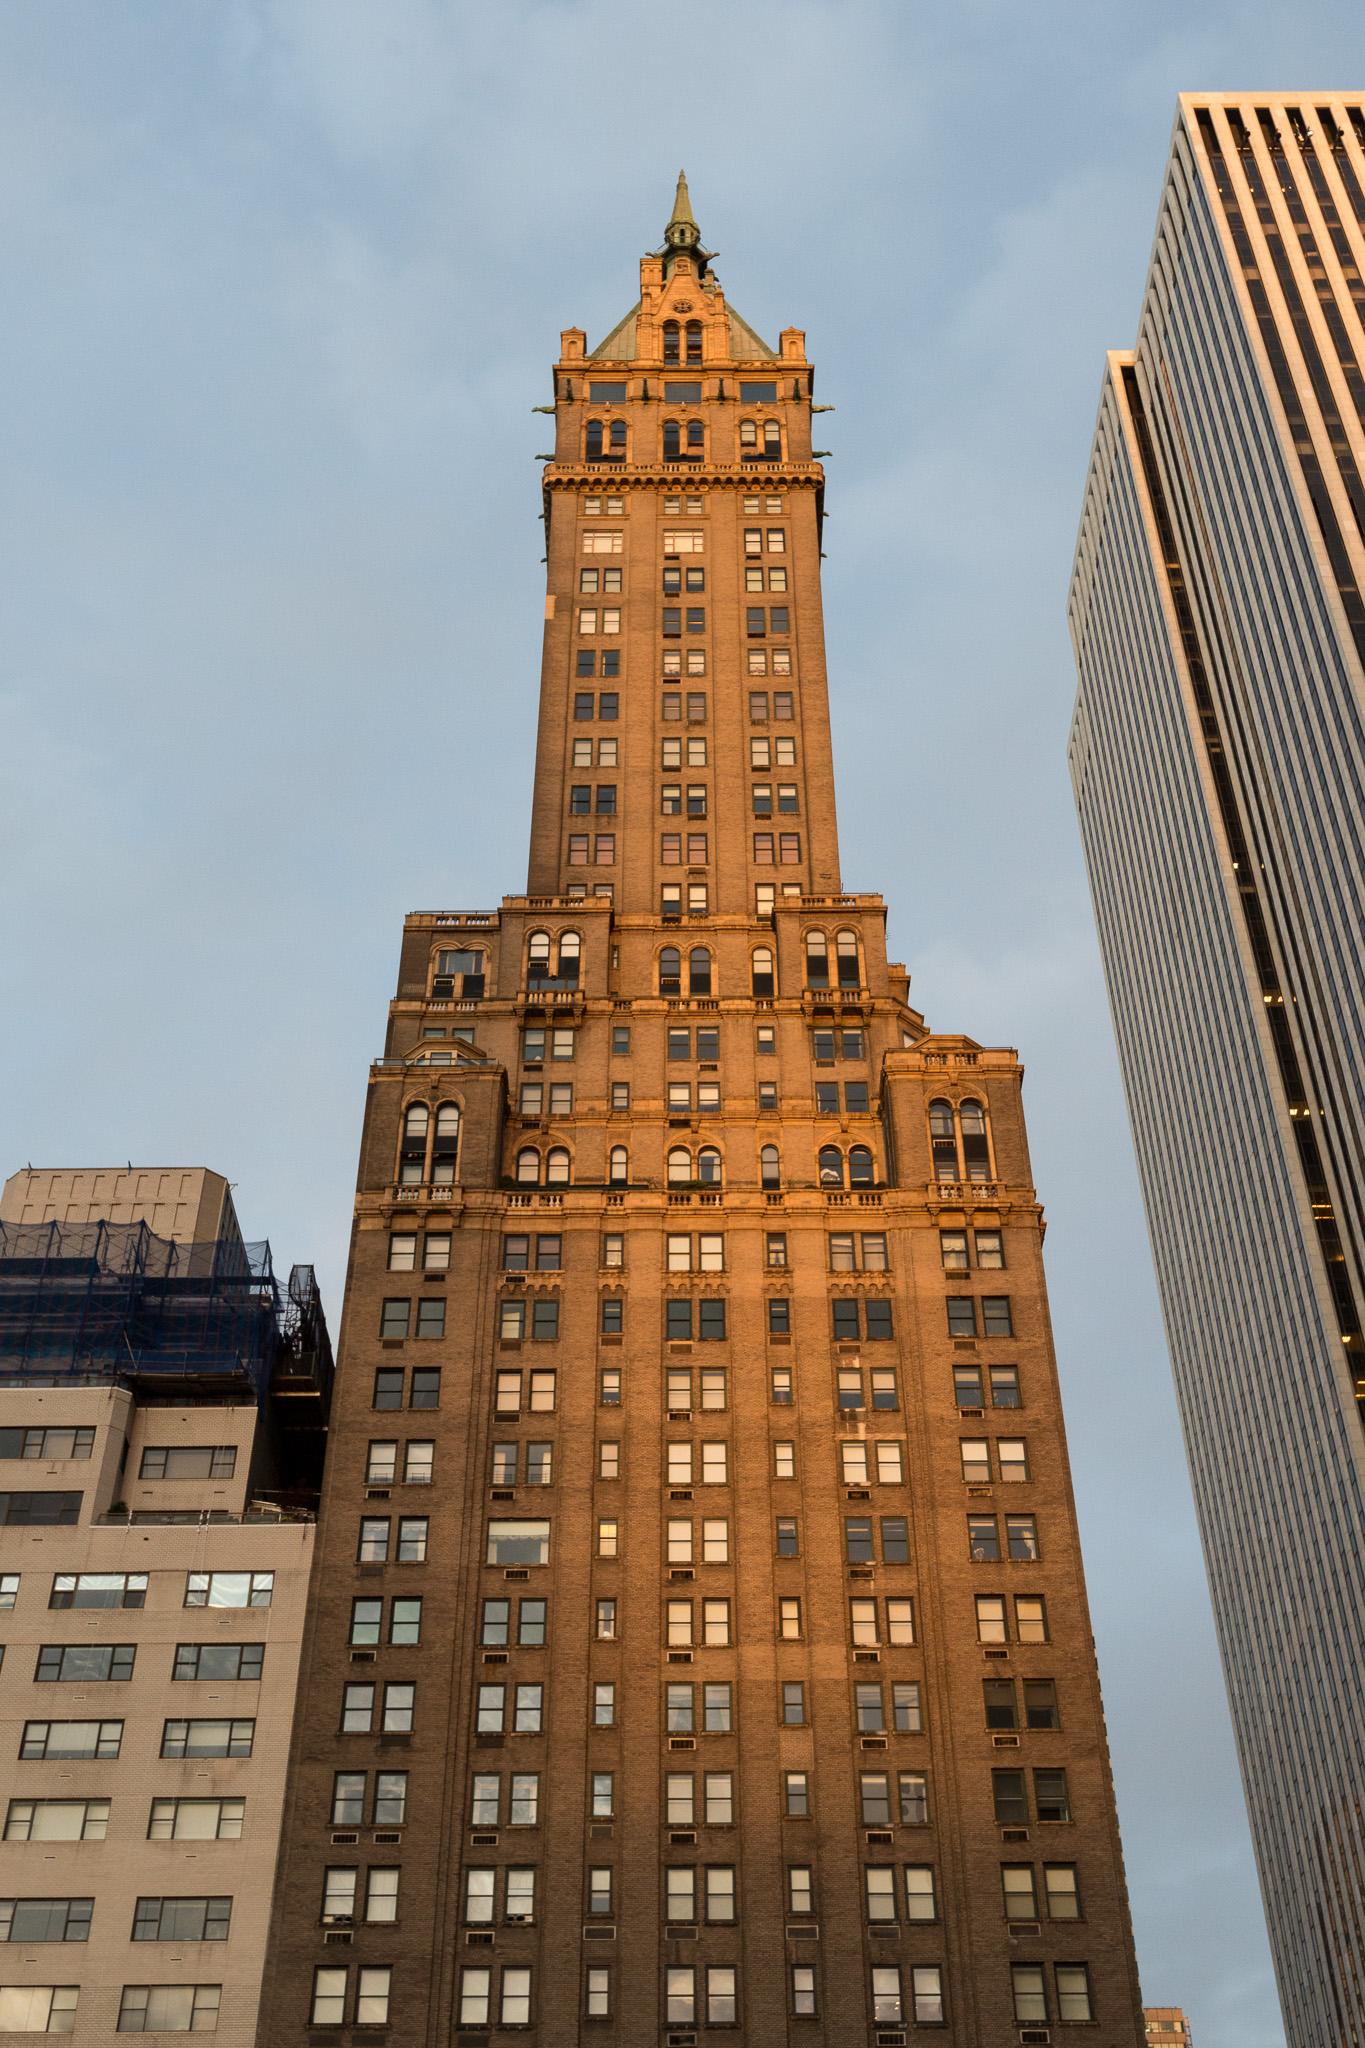 Skyscraper Archives - Patrick M  Kelly's Bulletin Board